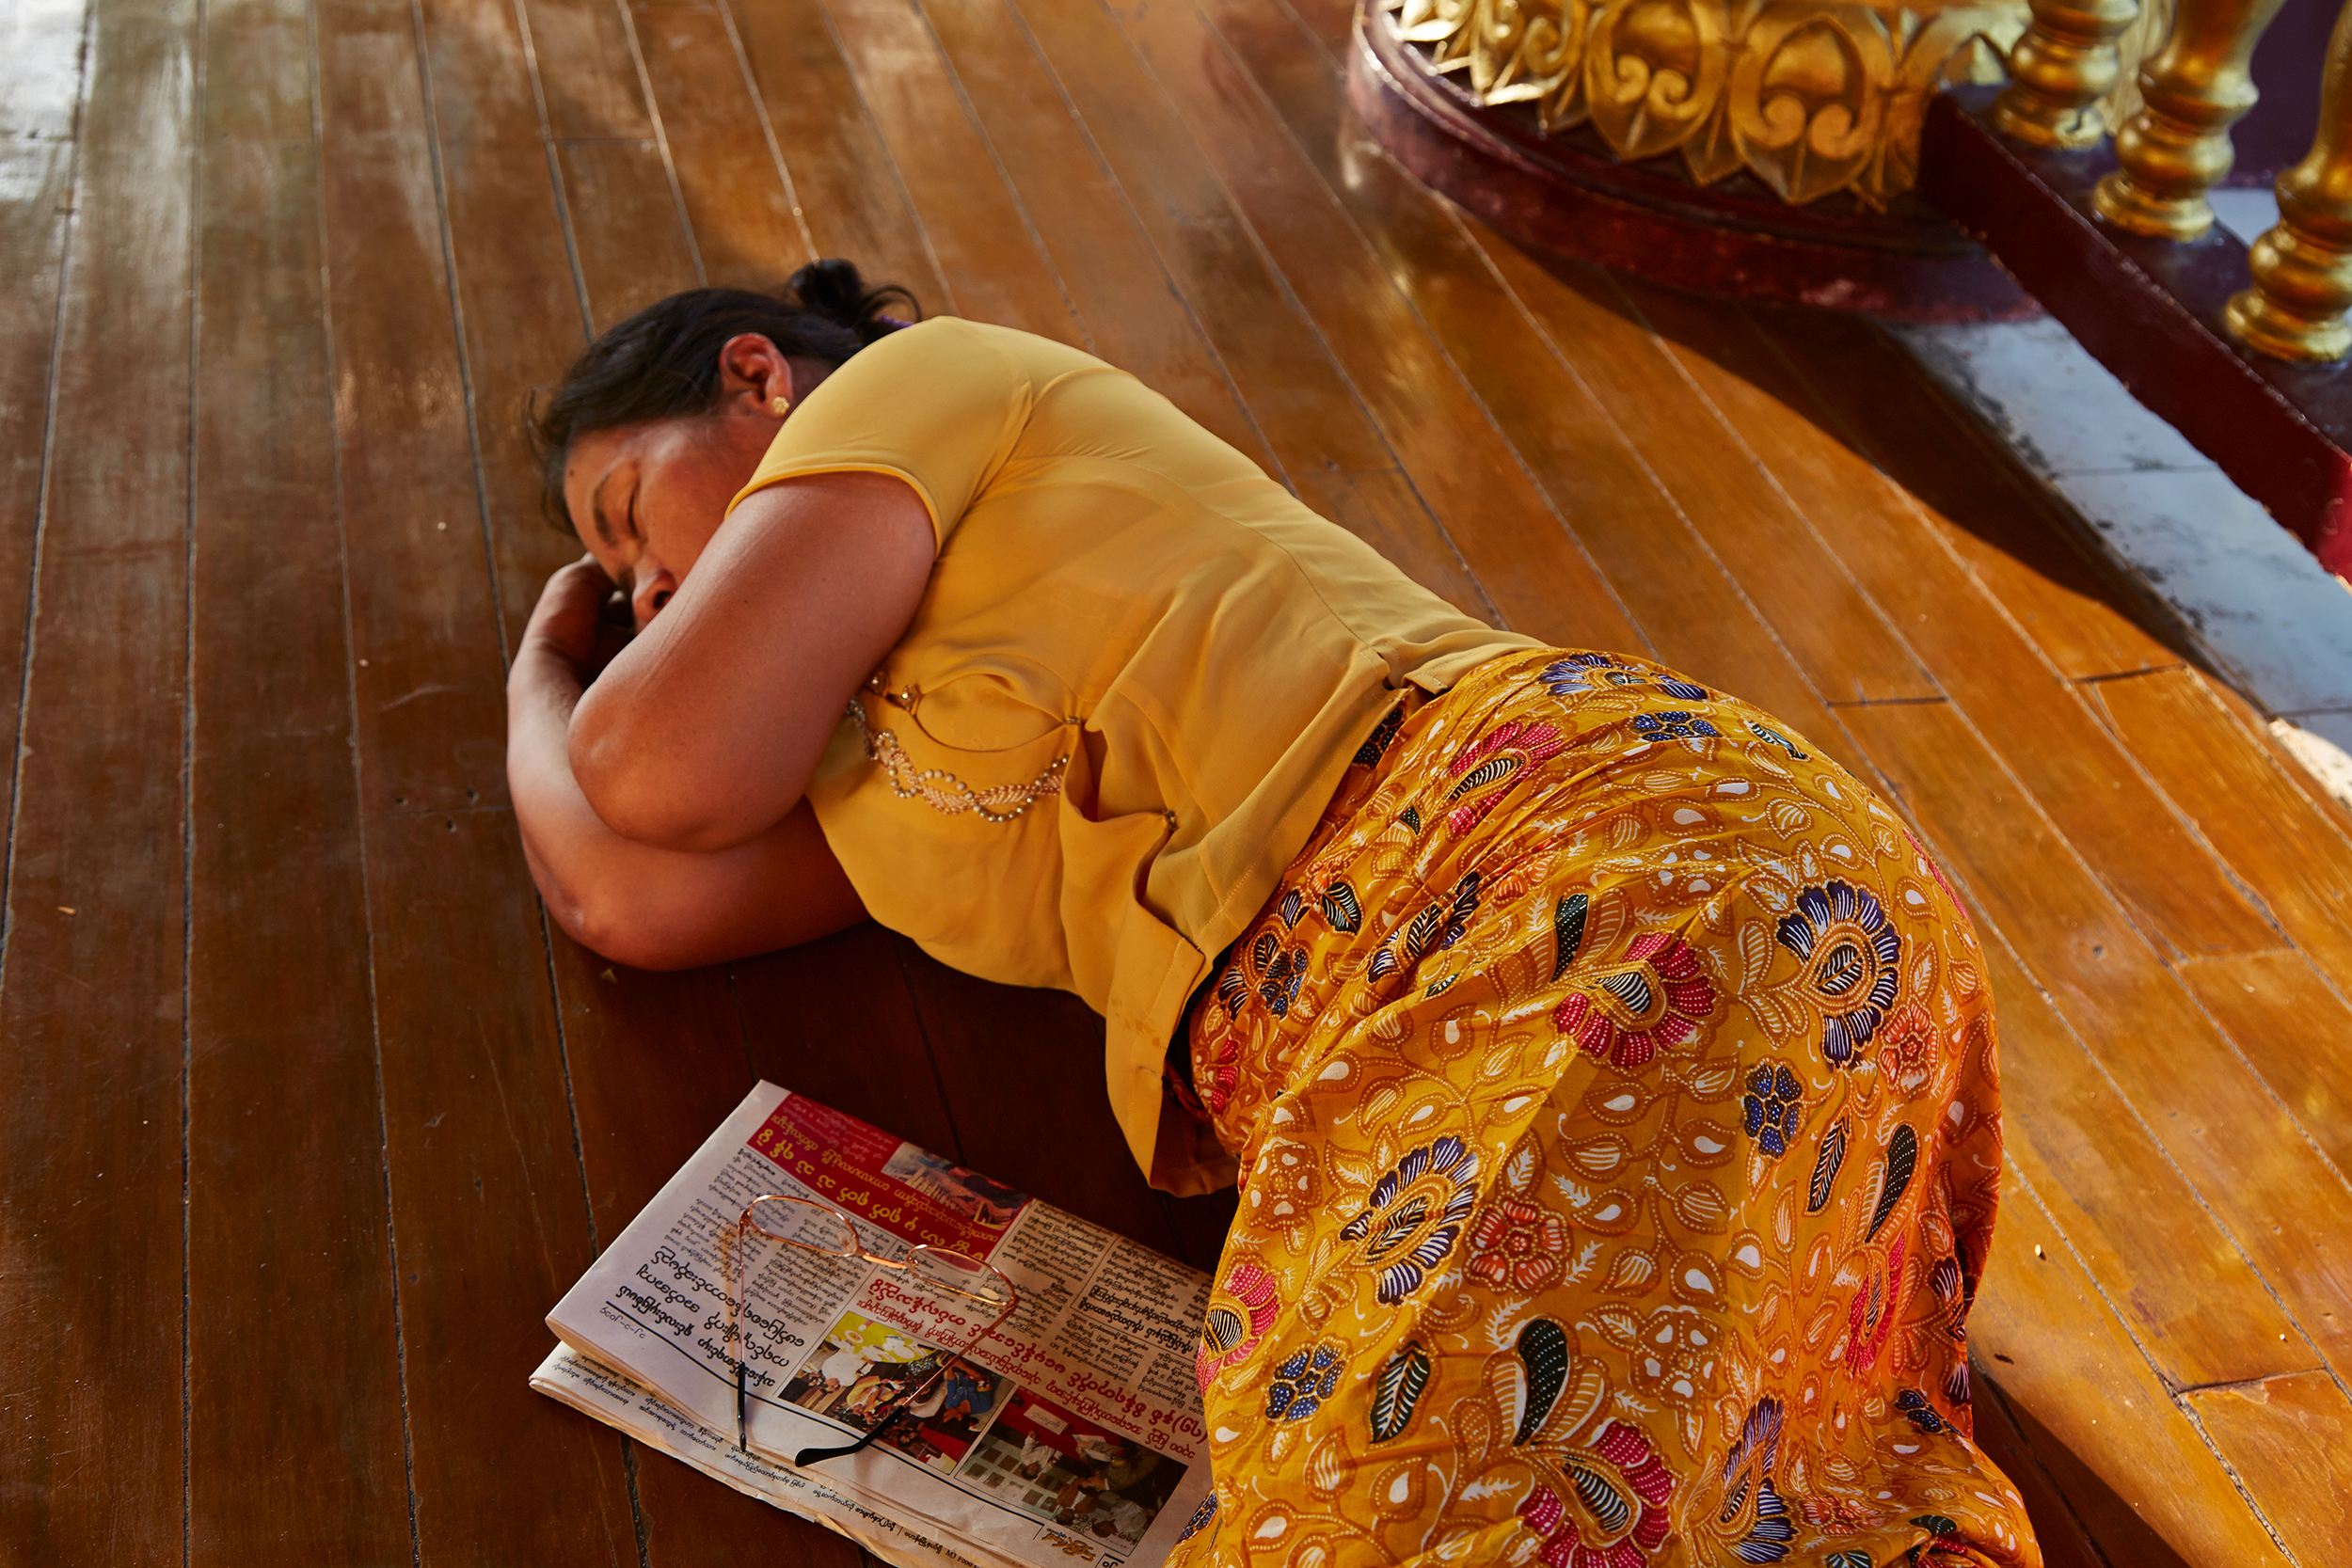 Kanjana-Chaiwatanachai-Image-Works_Yangon_2014.01.12_082w.jpg